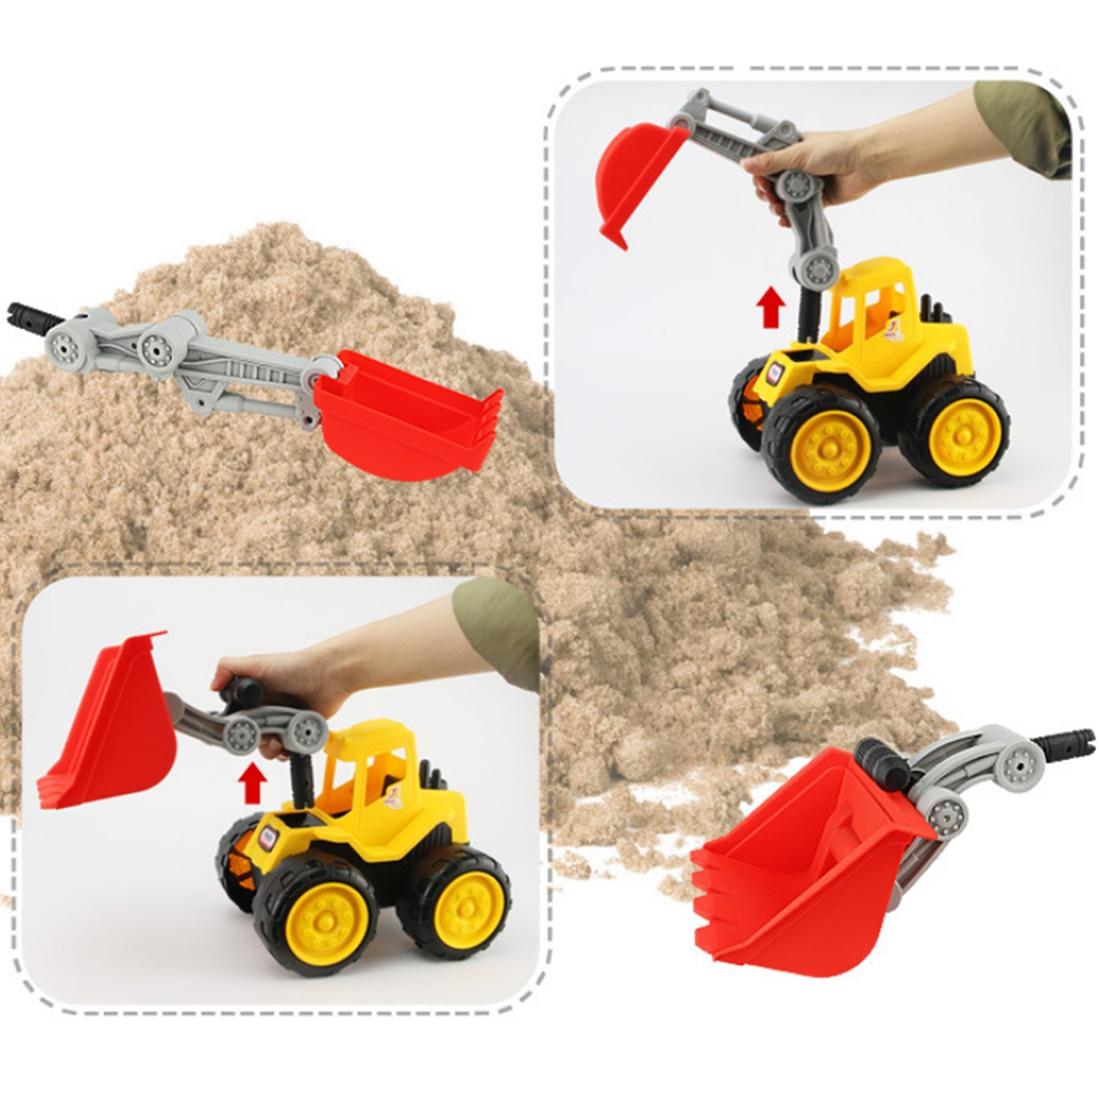 Surwish Beach Excavator Children Large Machineshop Truck Series Simulation Kids Fancy Toys - Color Random